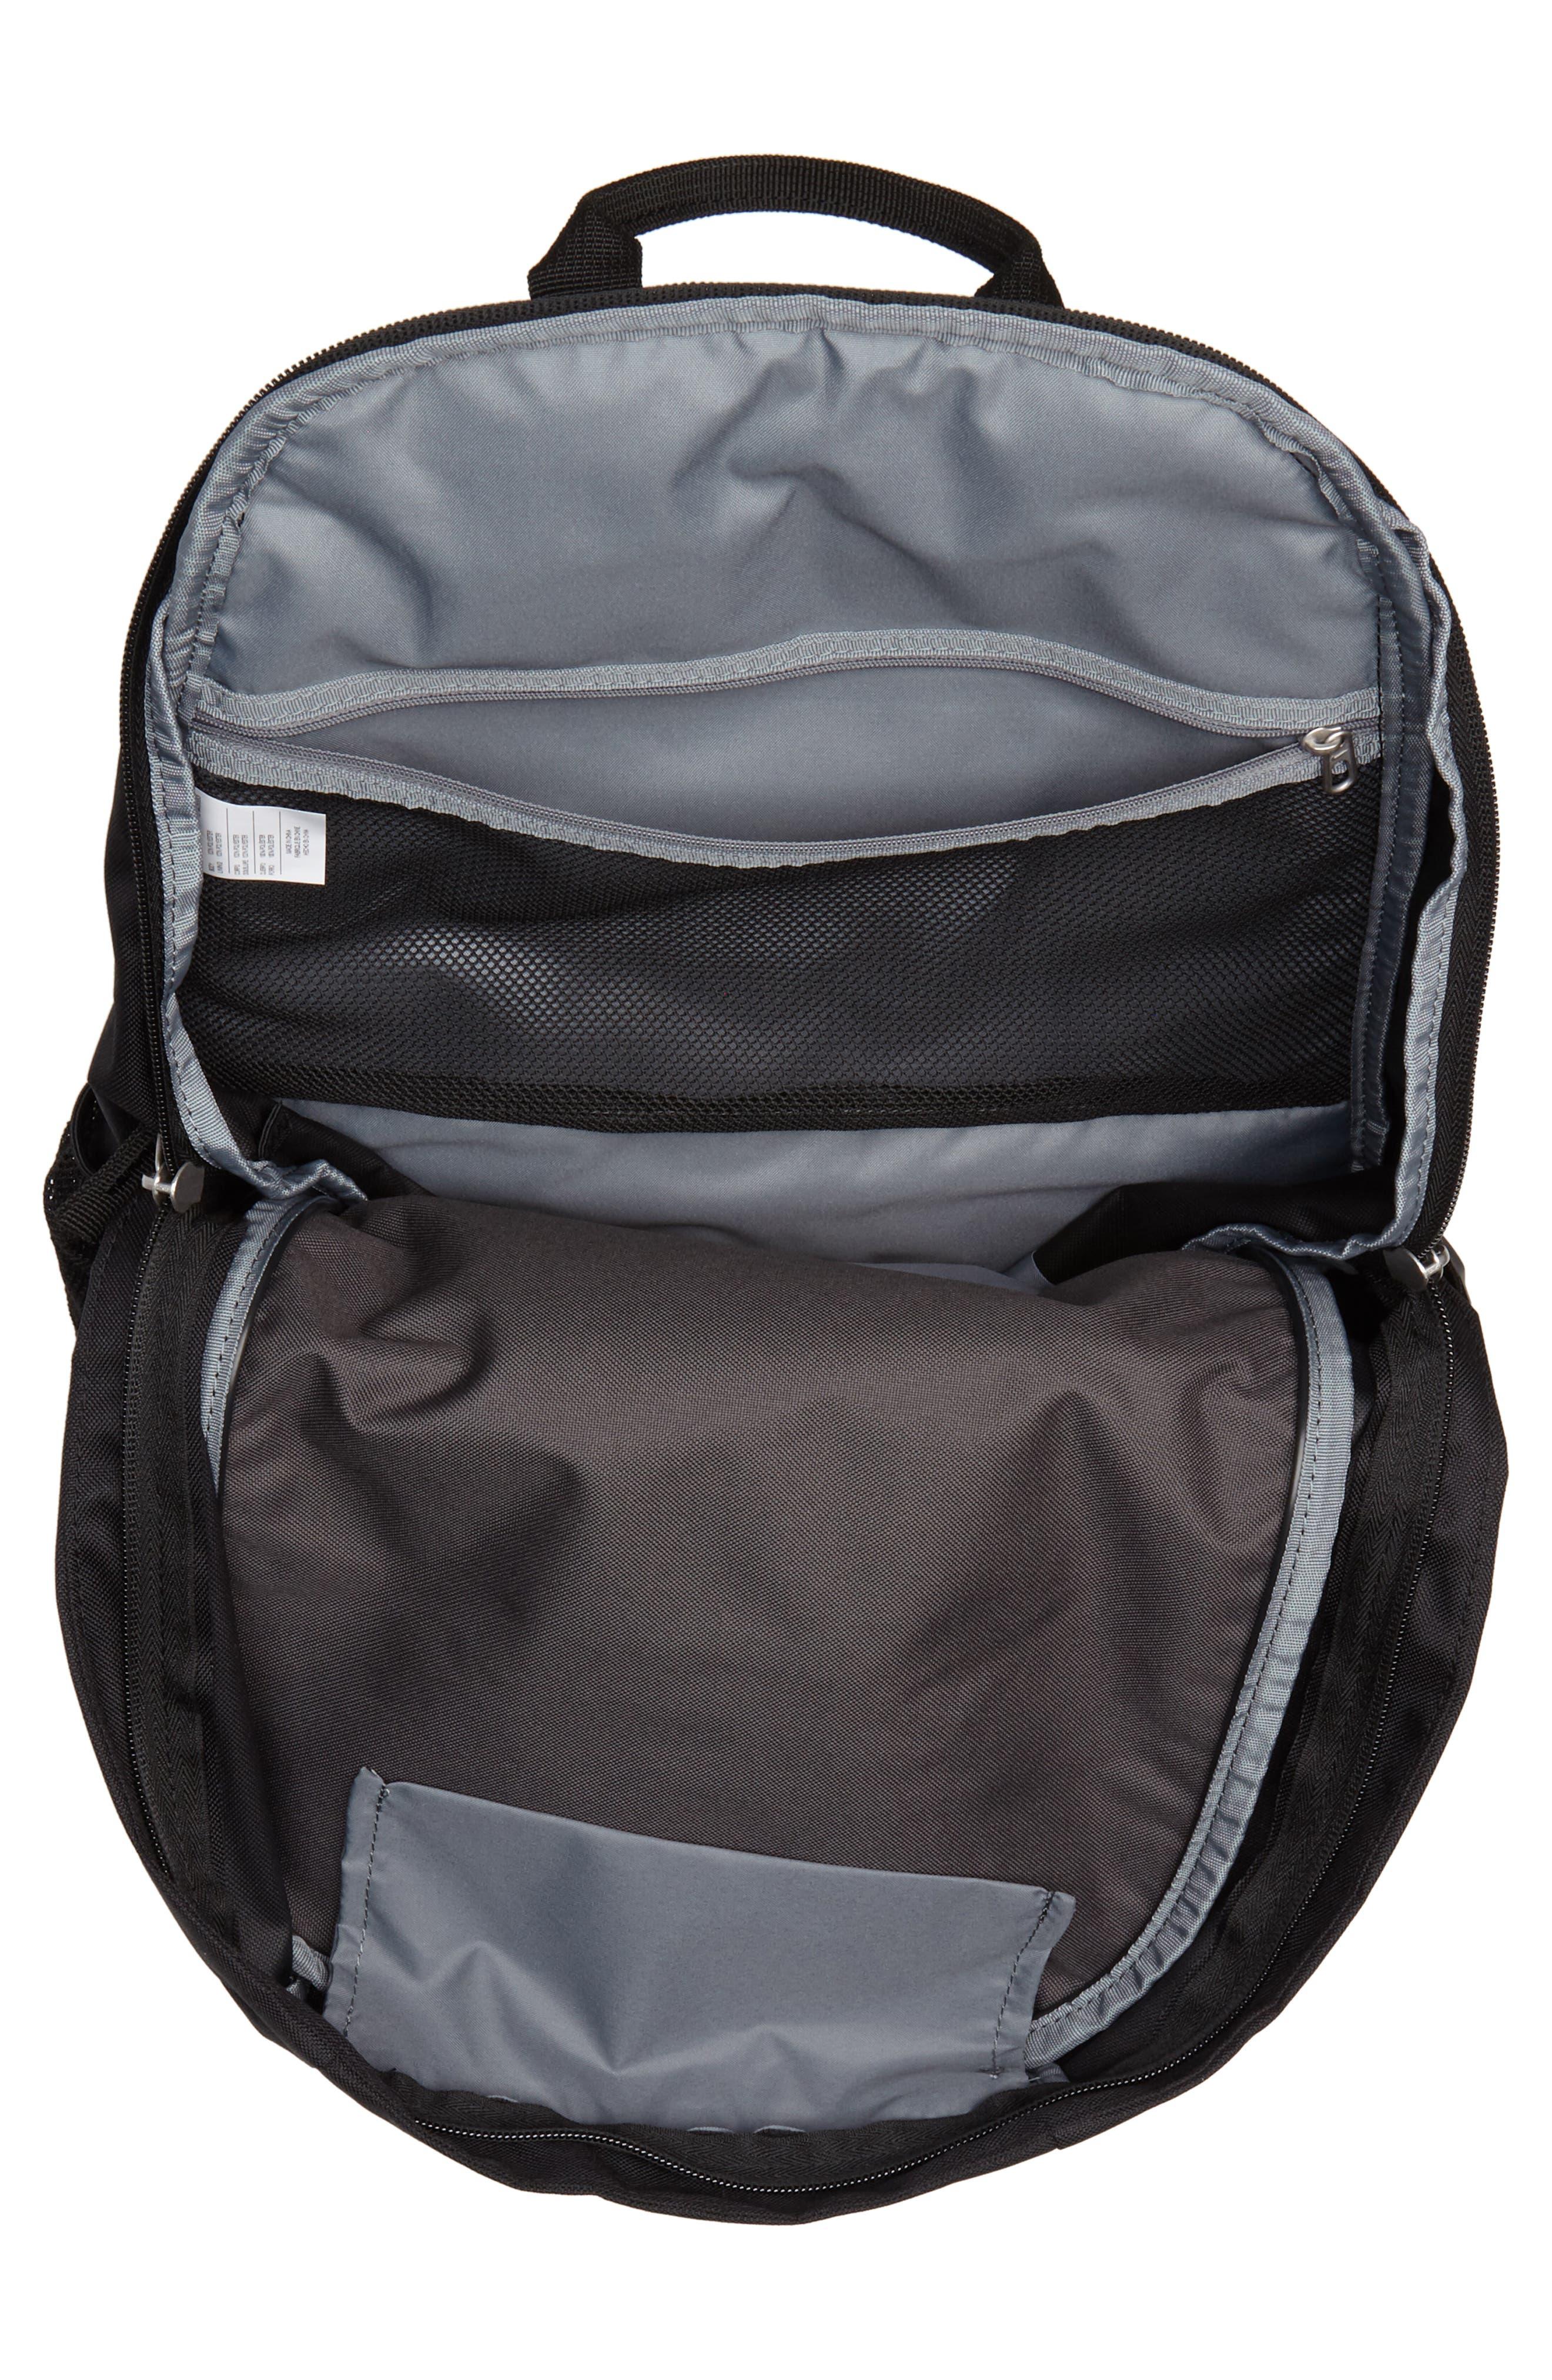 Club Team Backpack,                             Alternate thumbnail 4, color,                             Black/ Black/ White